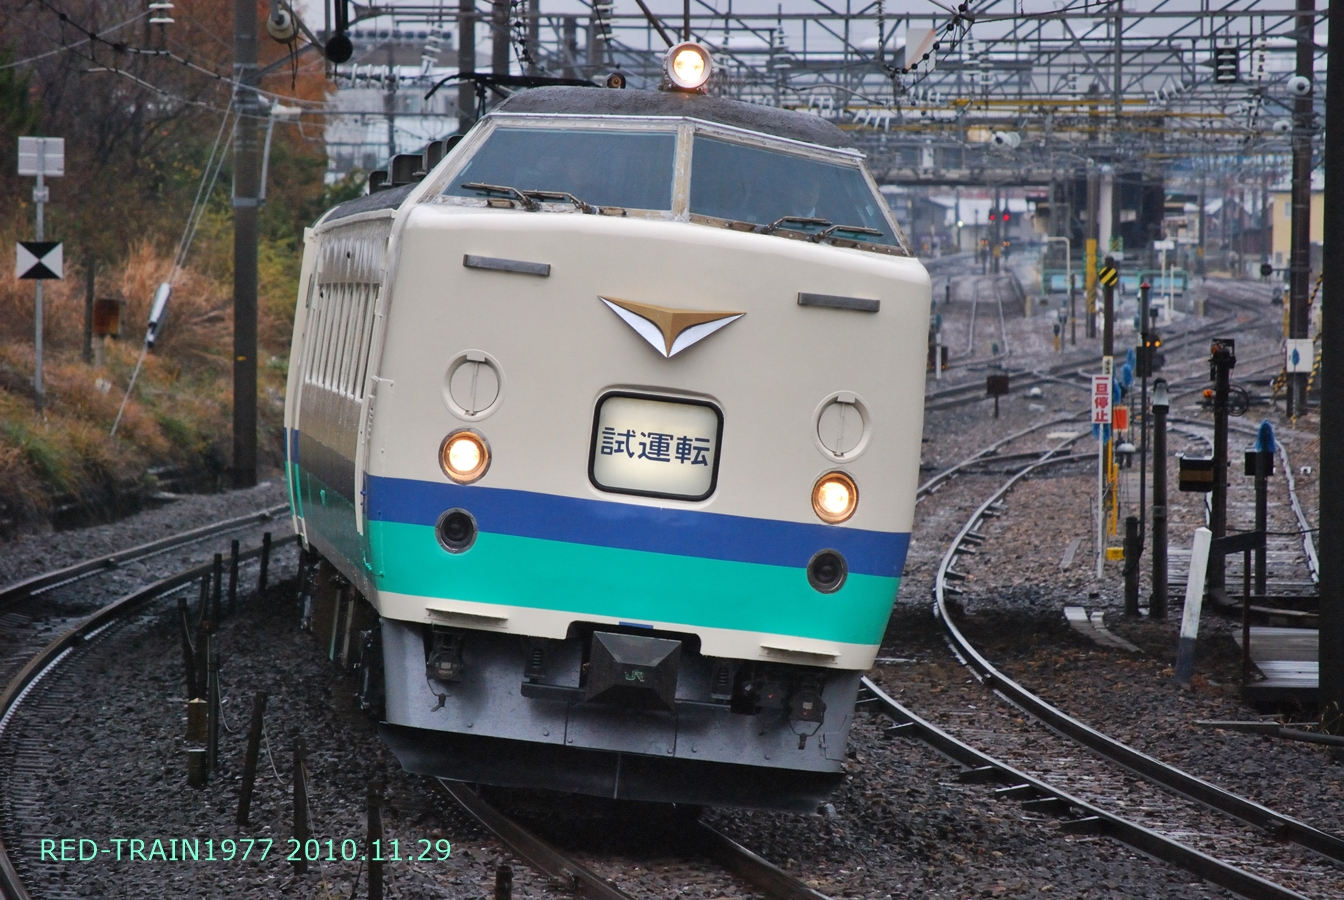 aDSC_0282_7039.jpg